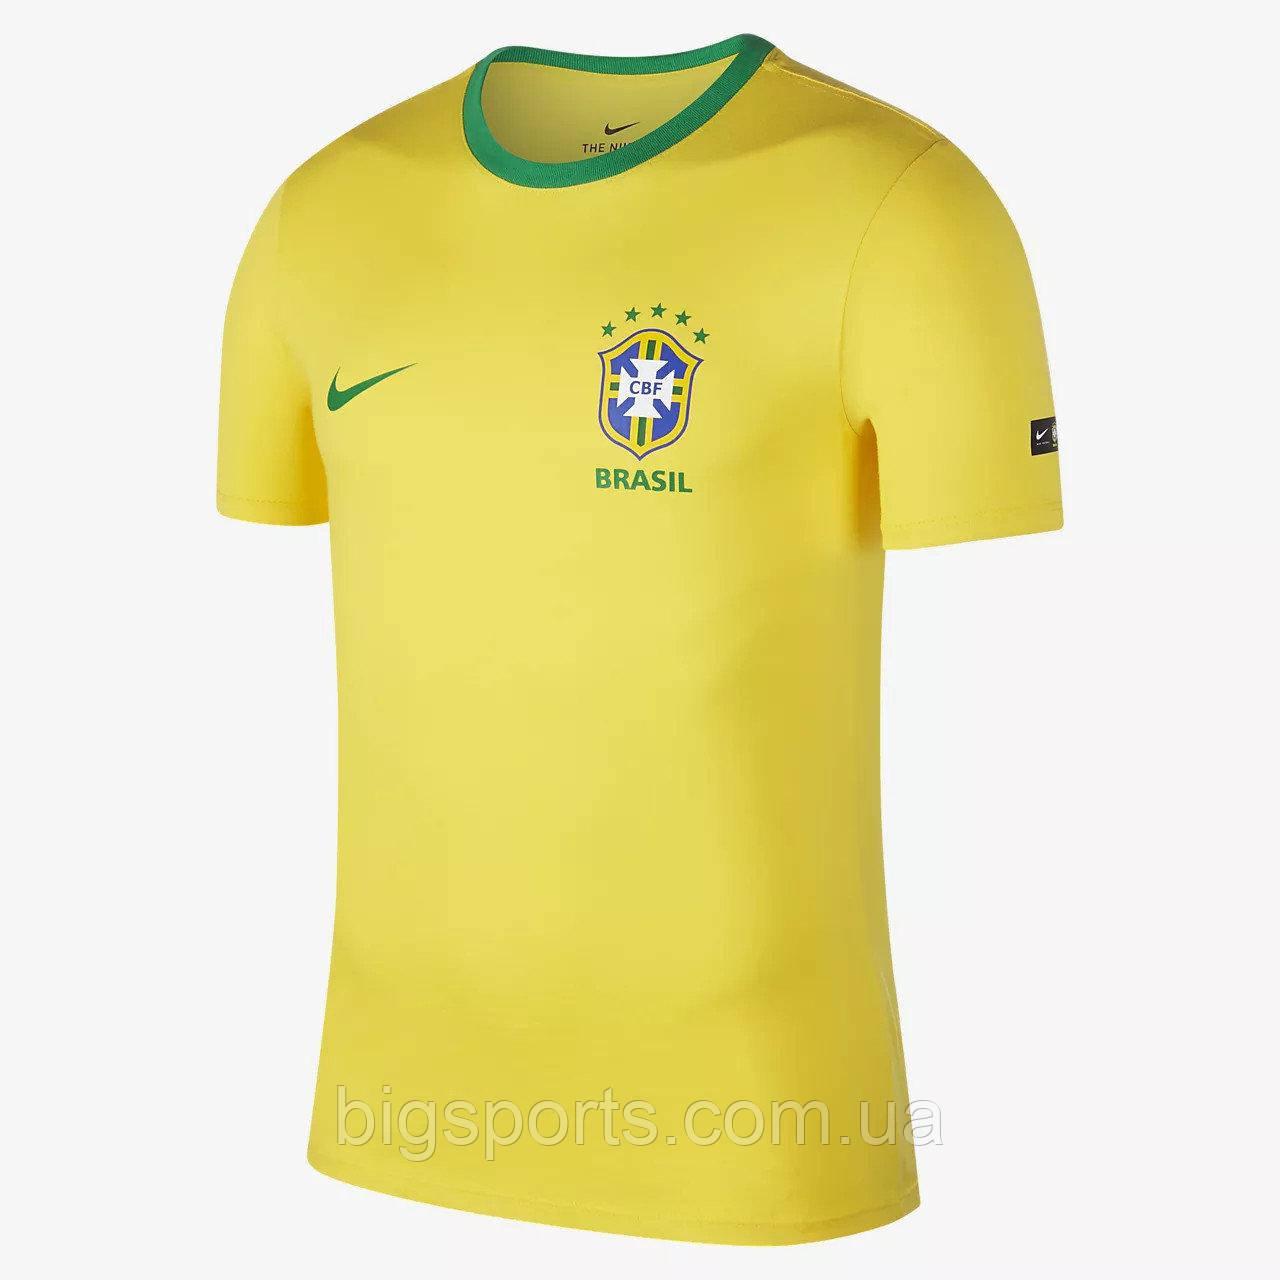 Футболка муж. Nike Cbf M Nk Tee Crest (арт. 888320-749)